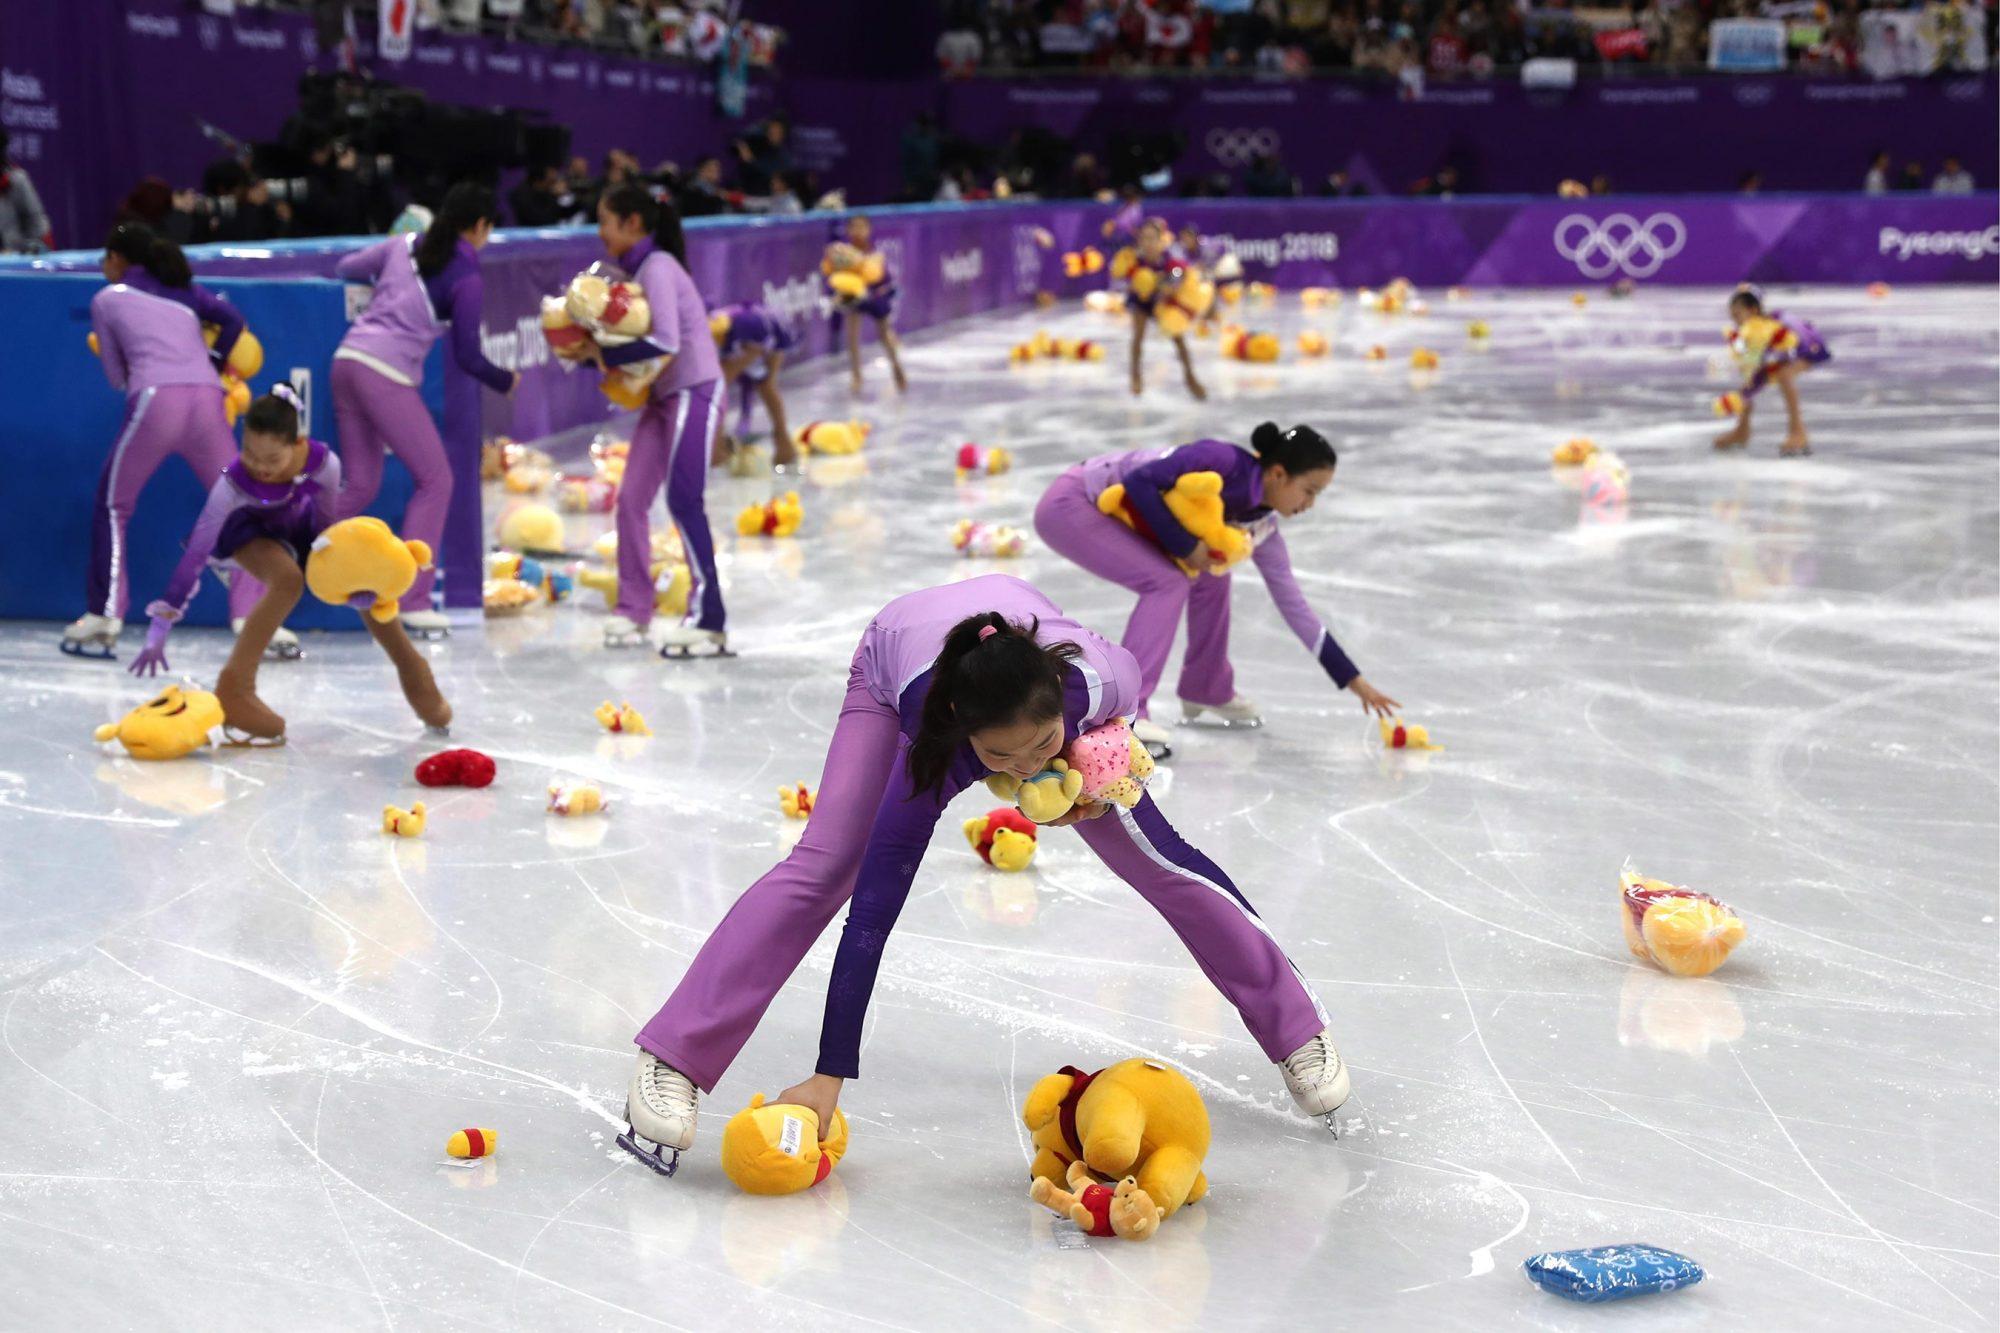 PyeongChang 2018 Olympics: Figure Skating, Men's Short Program